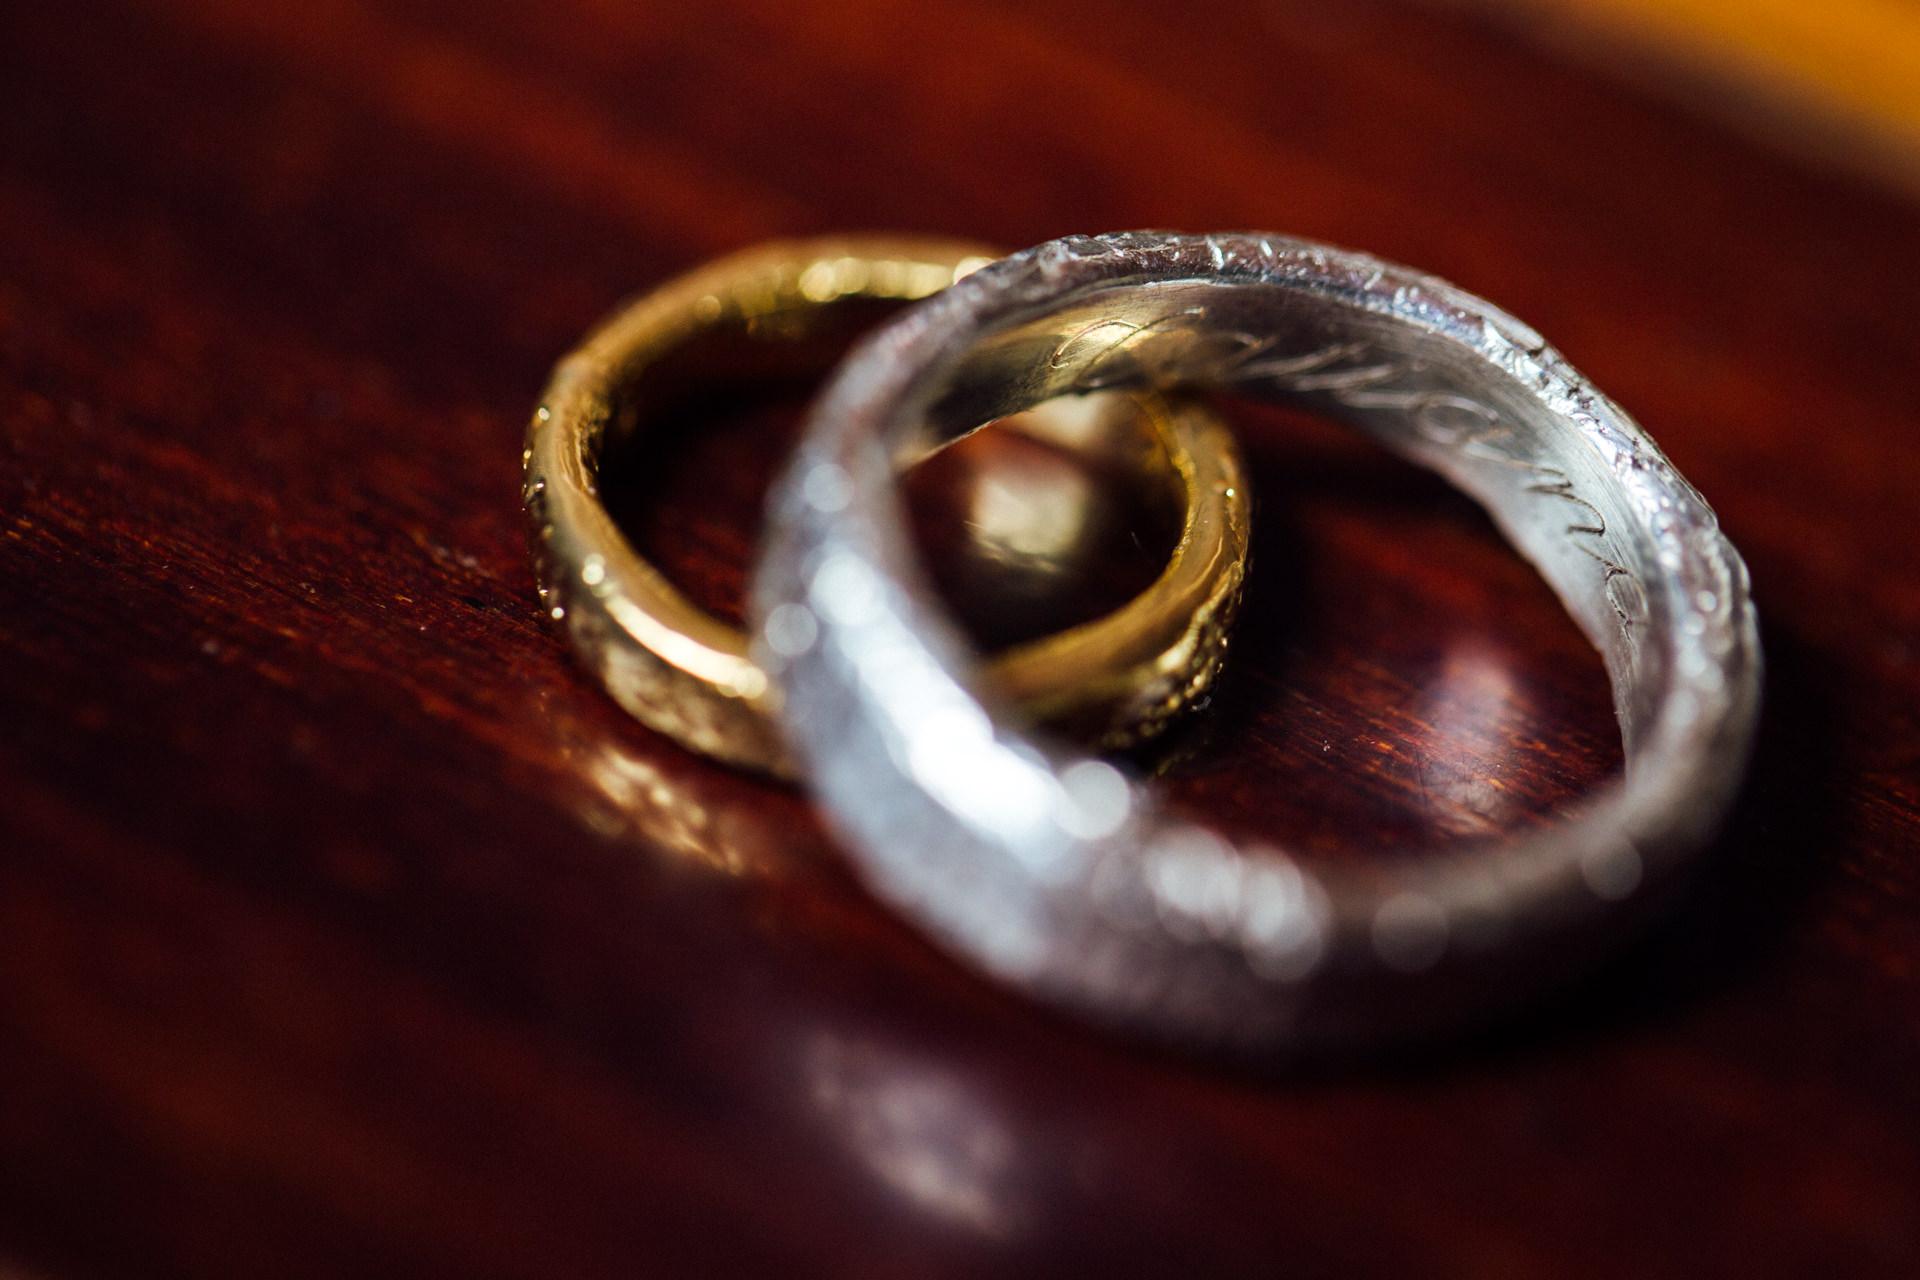 Wedding-Boda-Matrimonio-Fotografo-Fotografia-bodas-Medellin-Llanogrande-Colombia-Bogota-Cartagena-Miami-Wed-Destination-Photojournalism (24).JPG